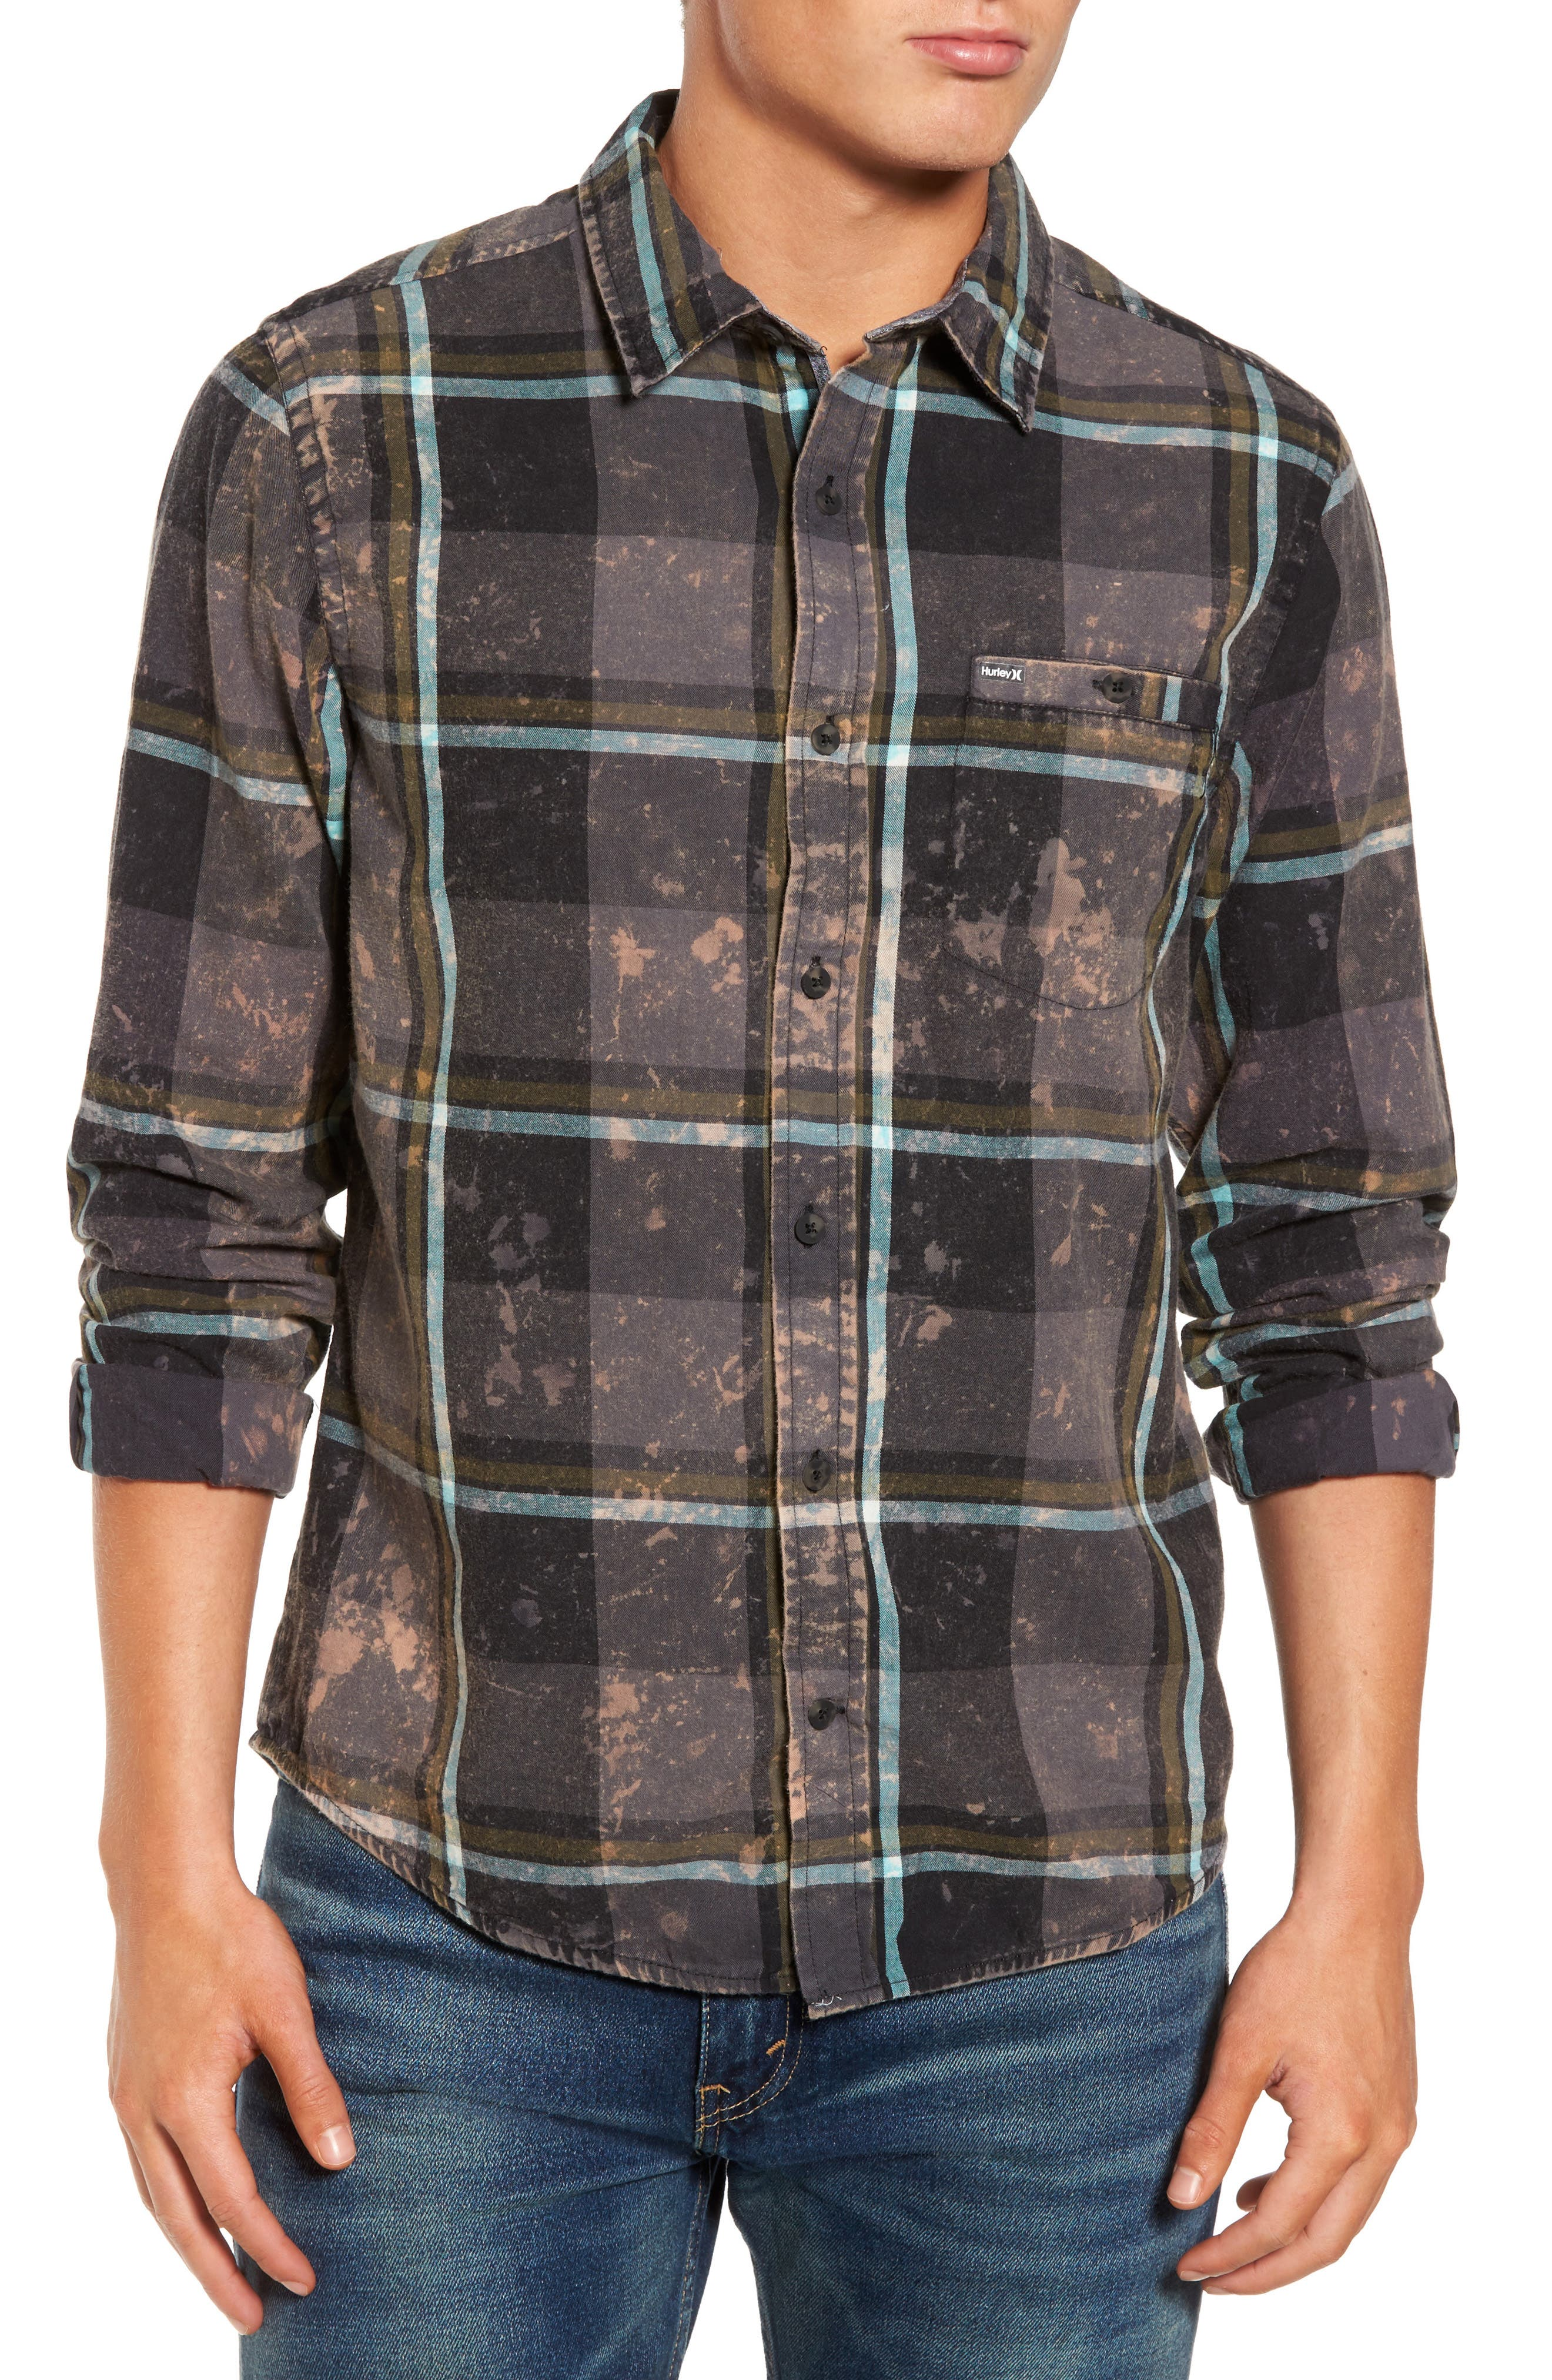 Alternate Image 1 Selected - Hurley Burnside Plaid Shirt